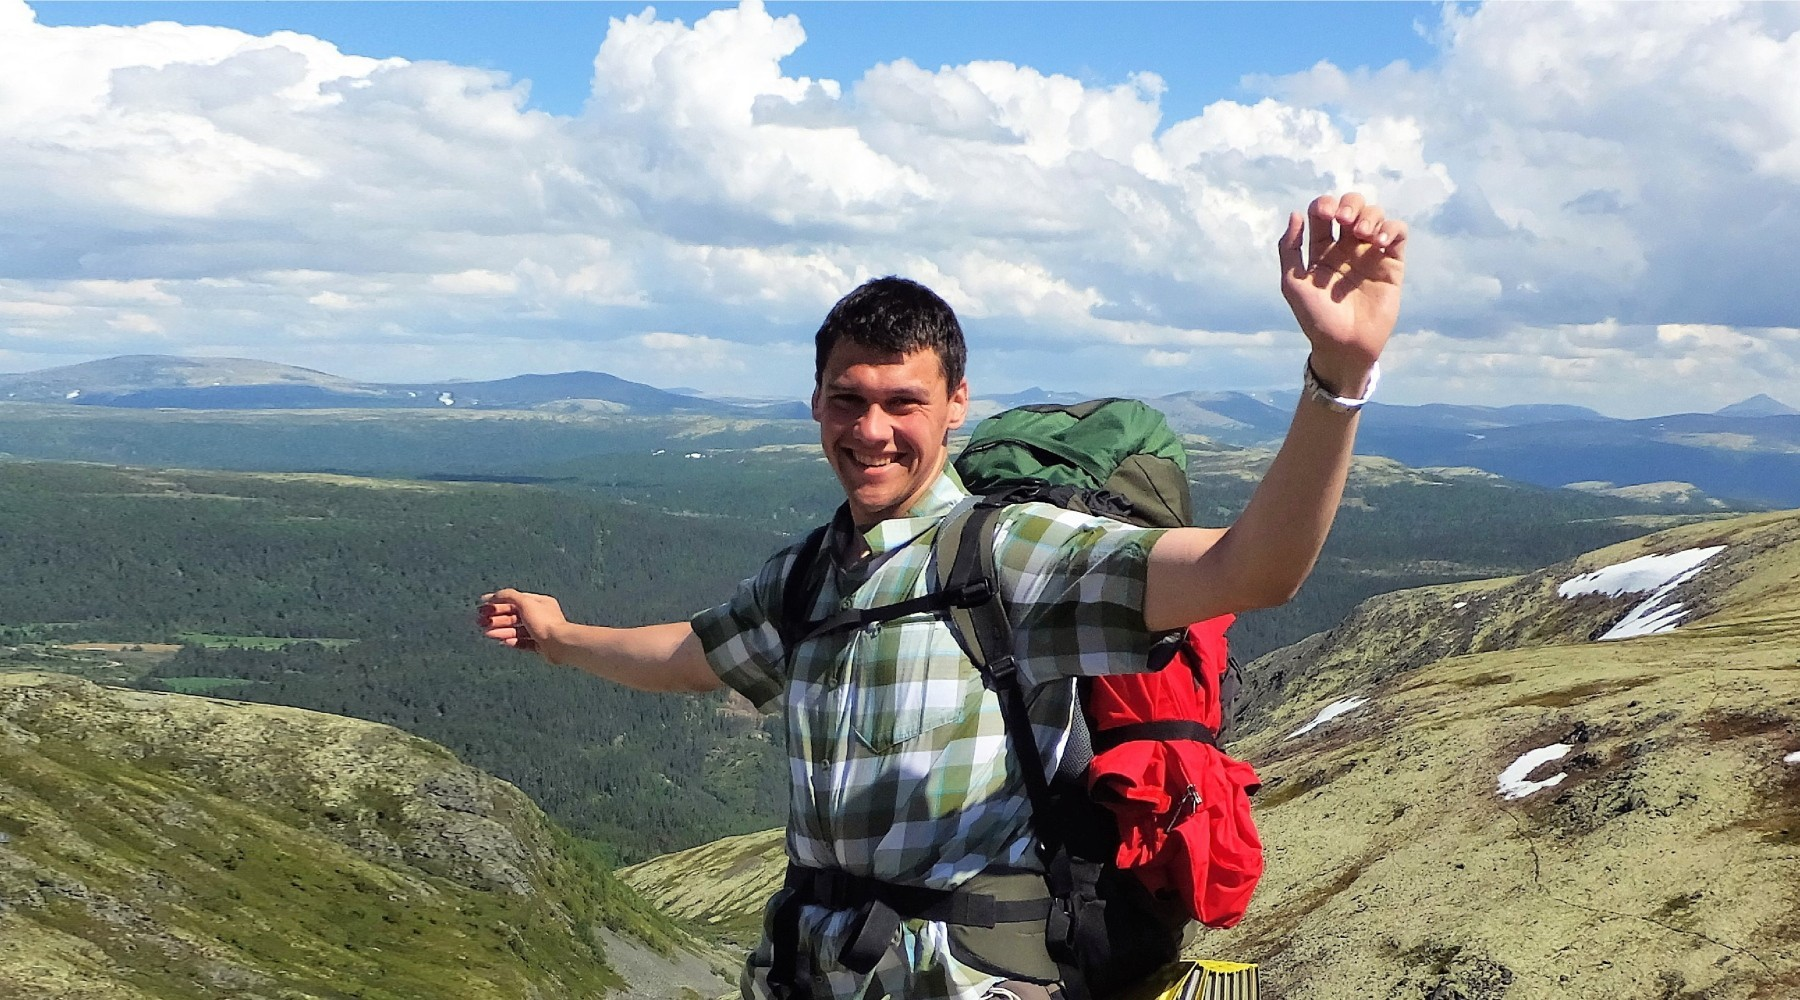 Trekkingtour Friluftsliv im Männerkreis (Bild)